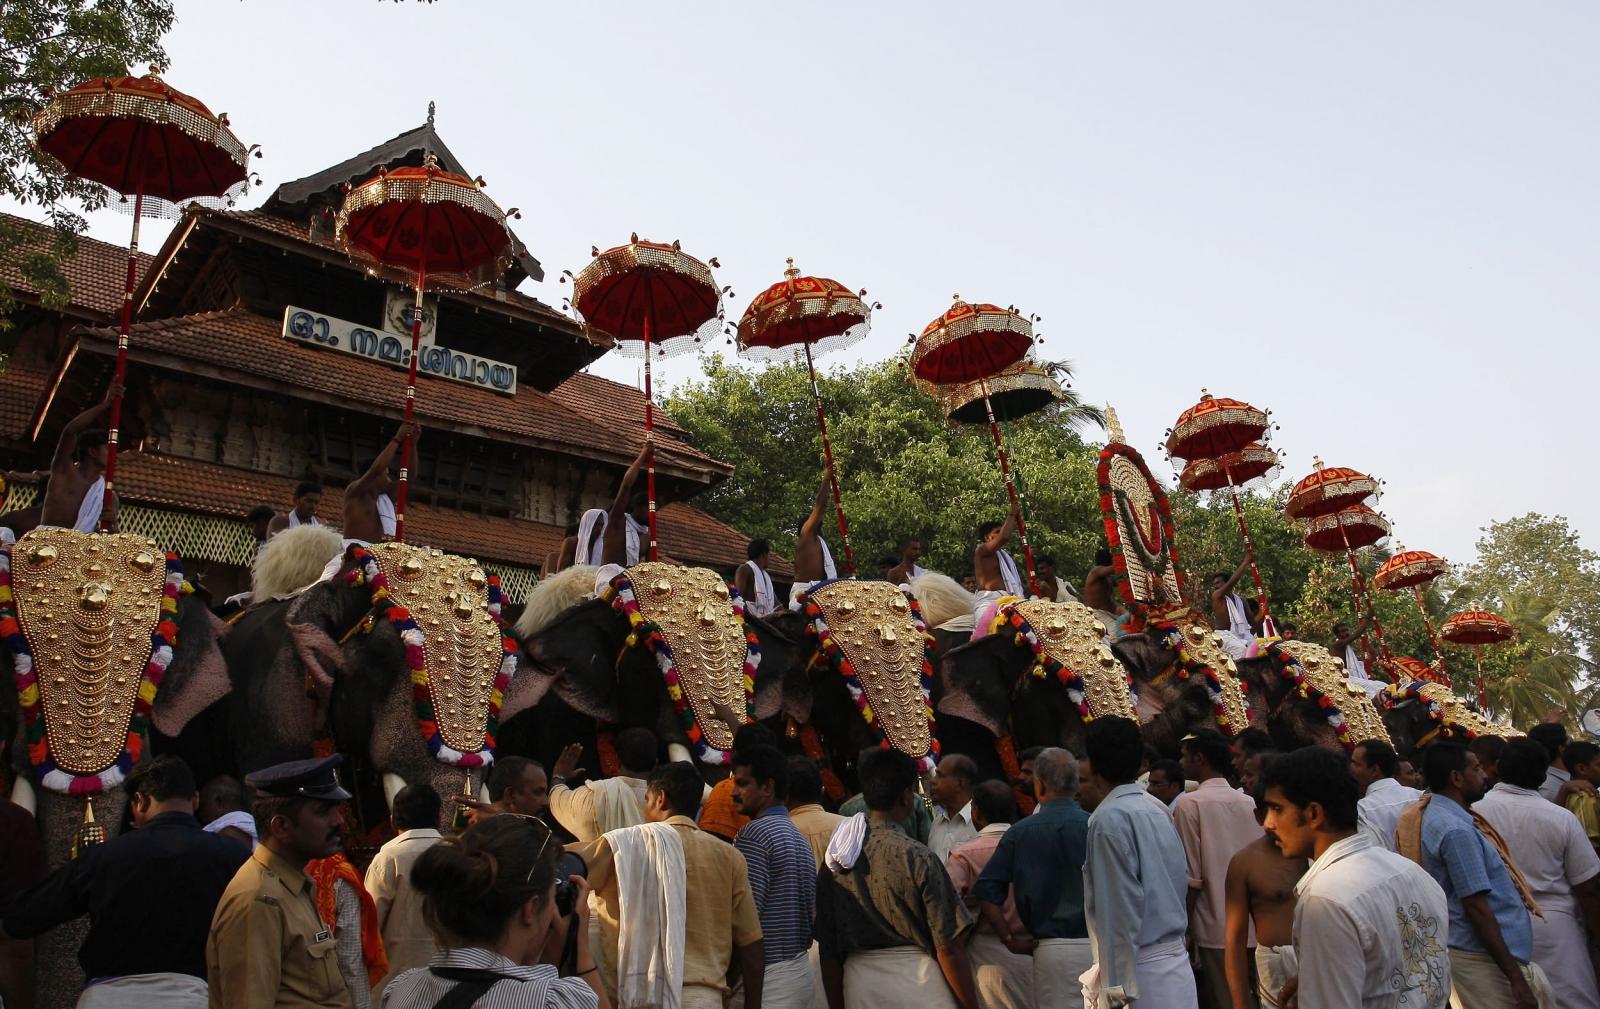 Temple elephants India